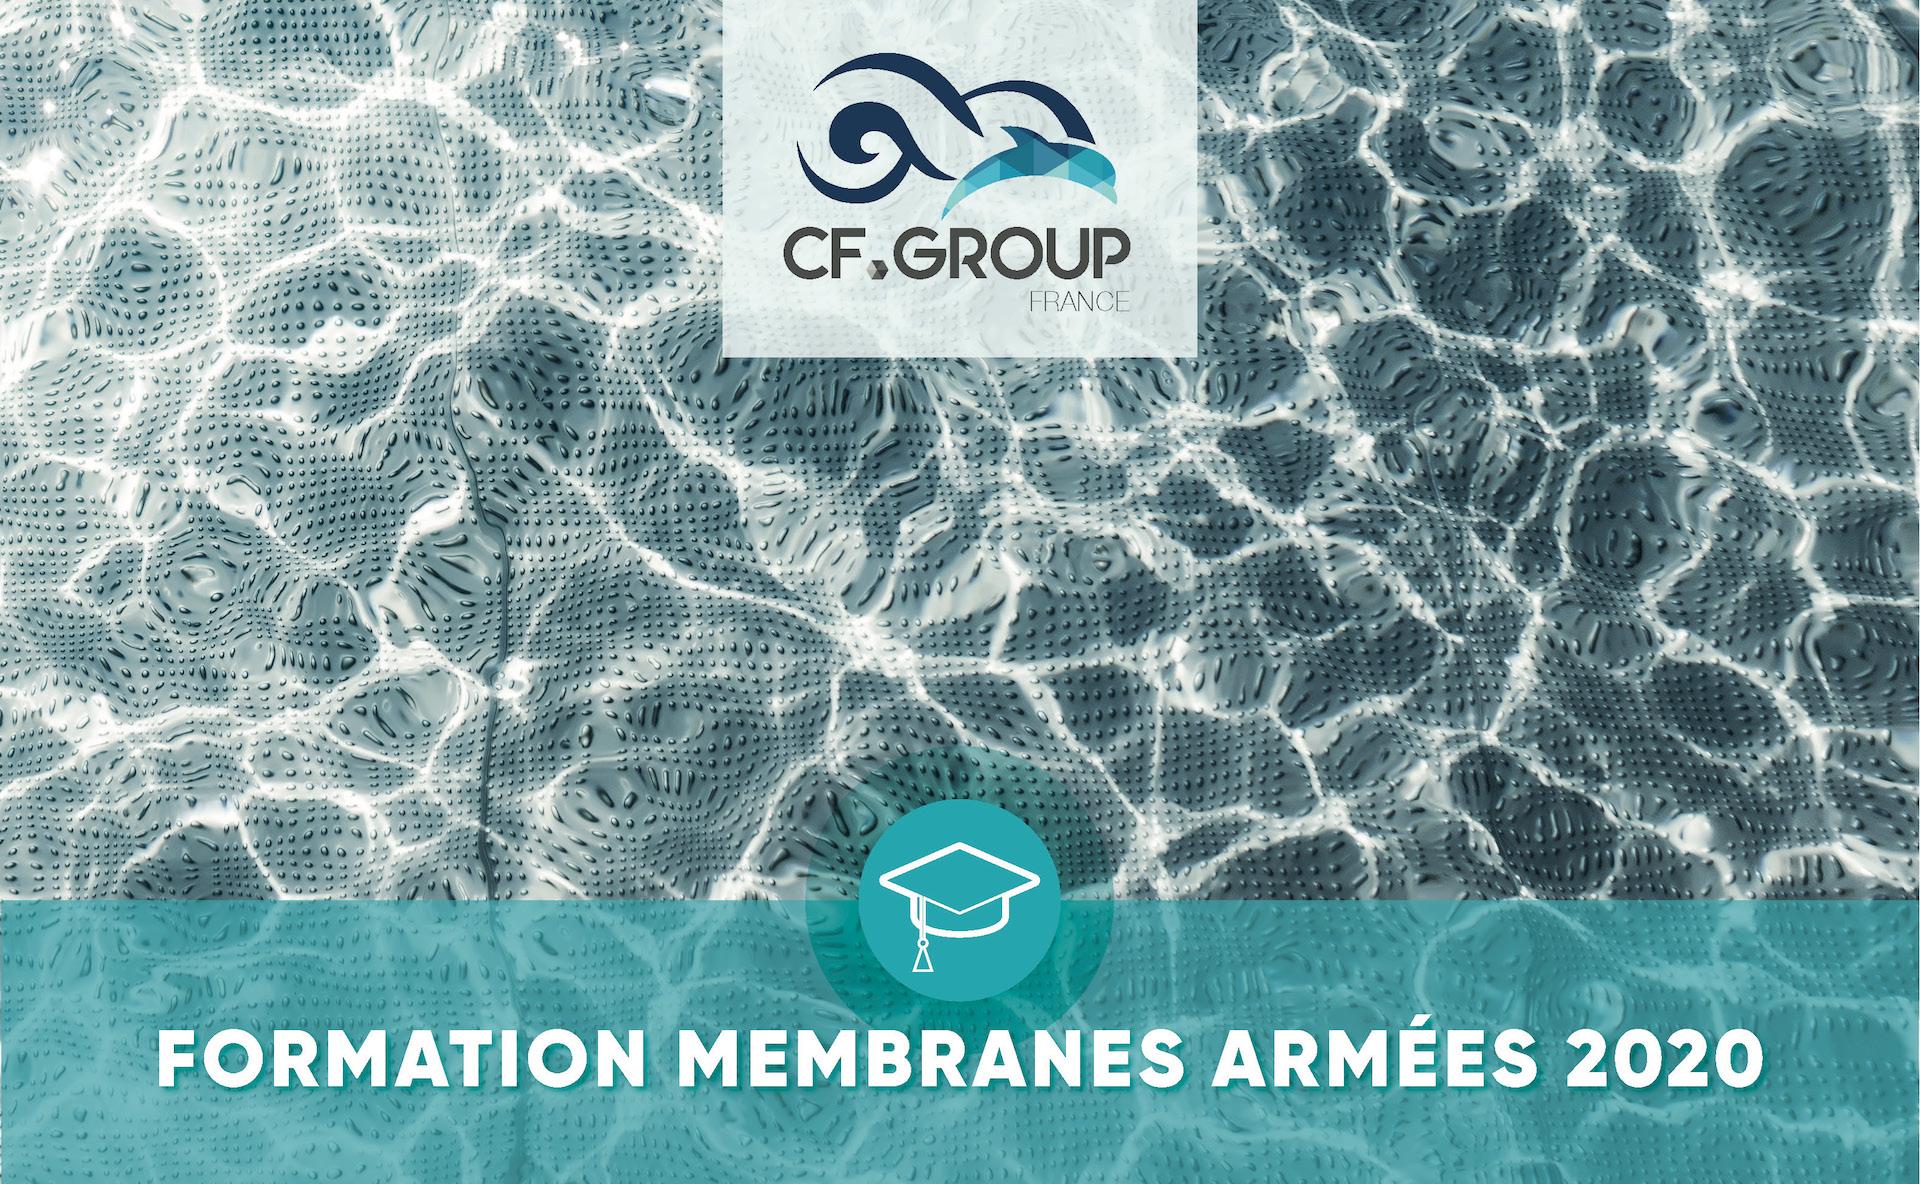 CF Group